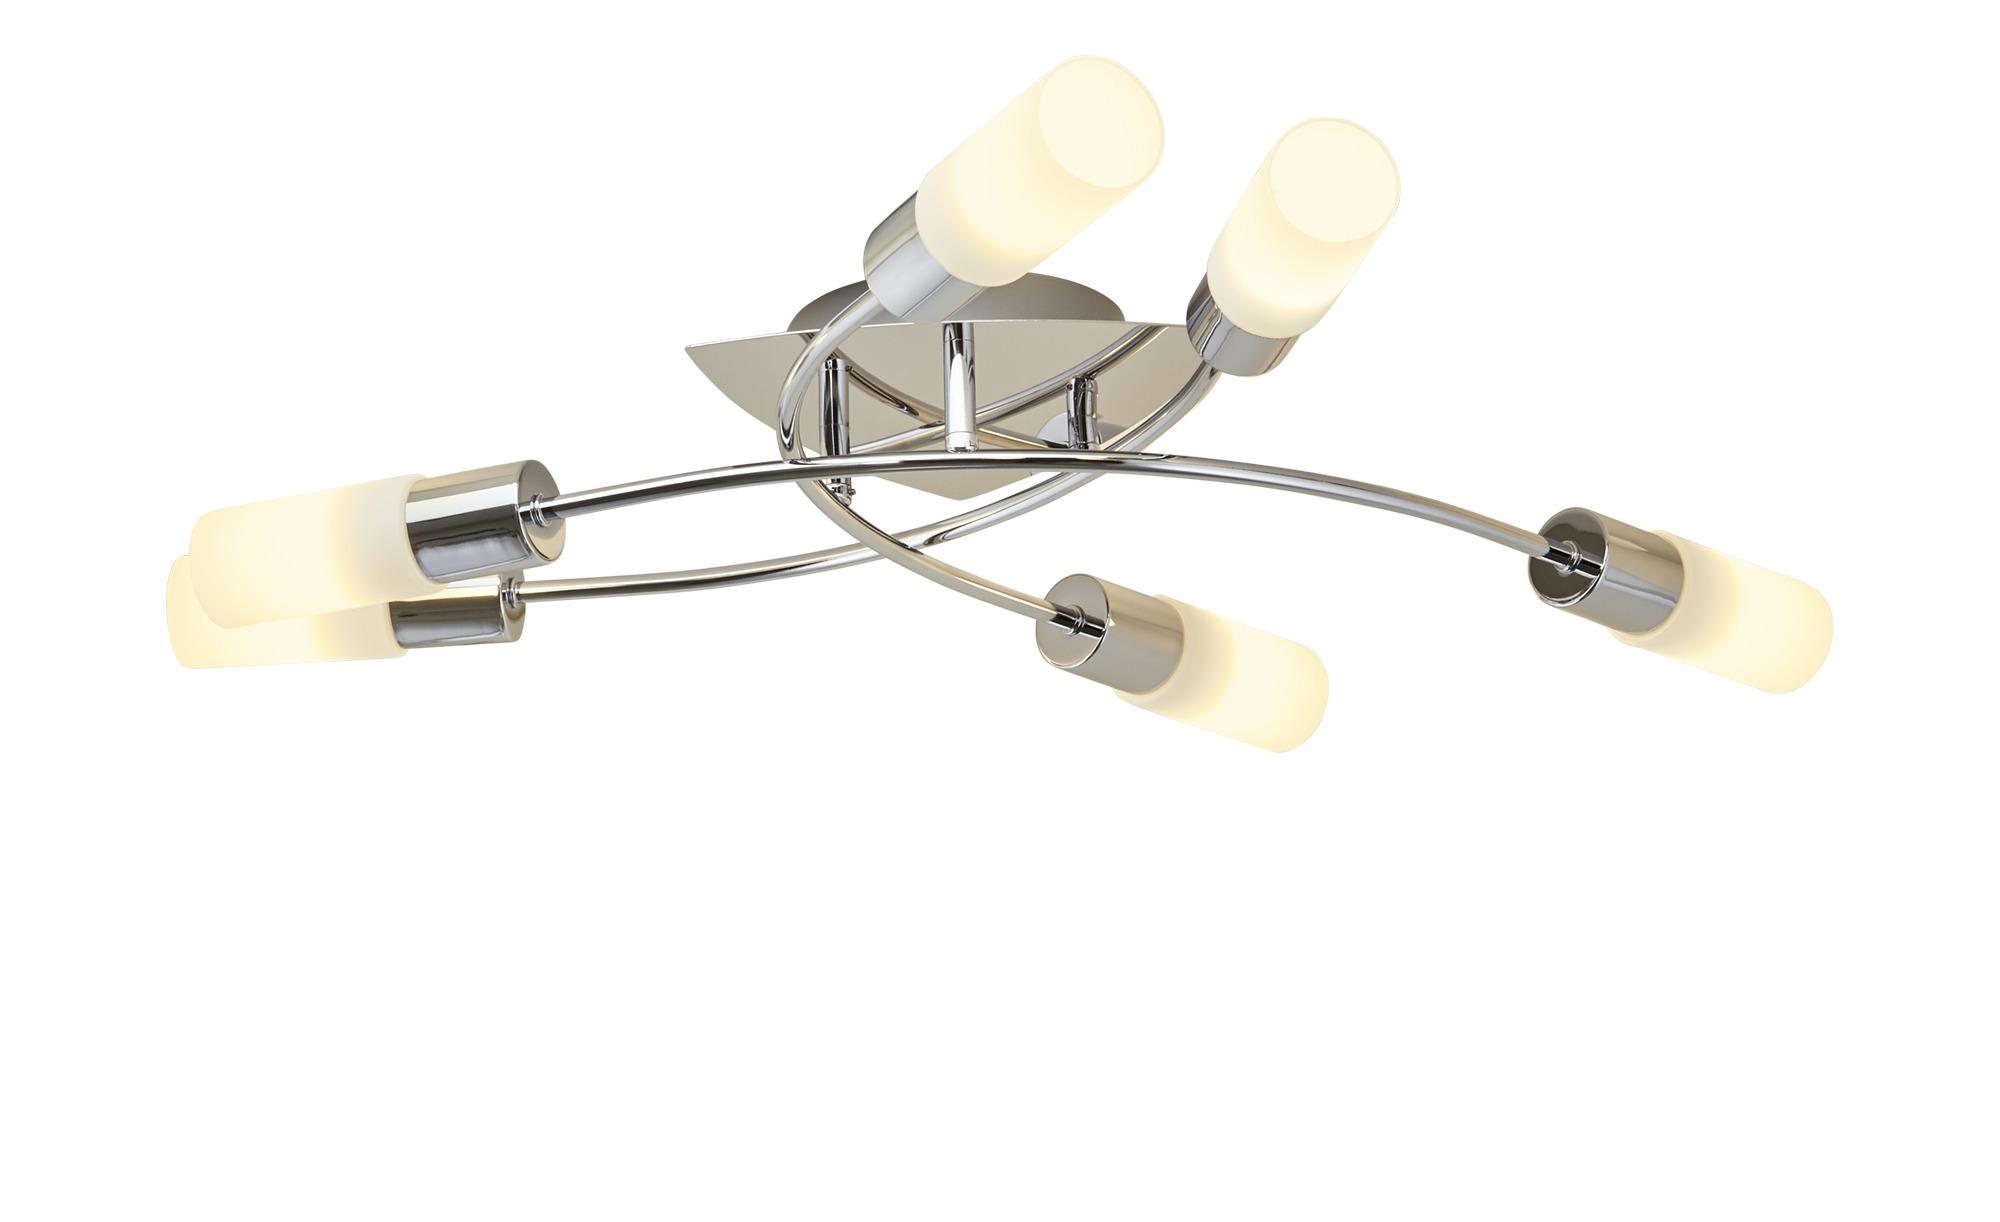 KHG LED-Deckenleuchte, 6-flammig ¦ silber ¦ Maße (cm): B: 54,5 H: 10 Lampen & Leuchten > Innenleuchten > Deckenleuchten - Höffner